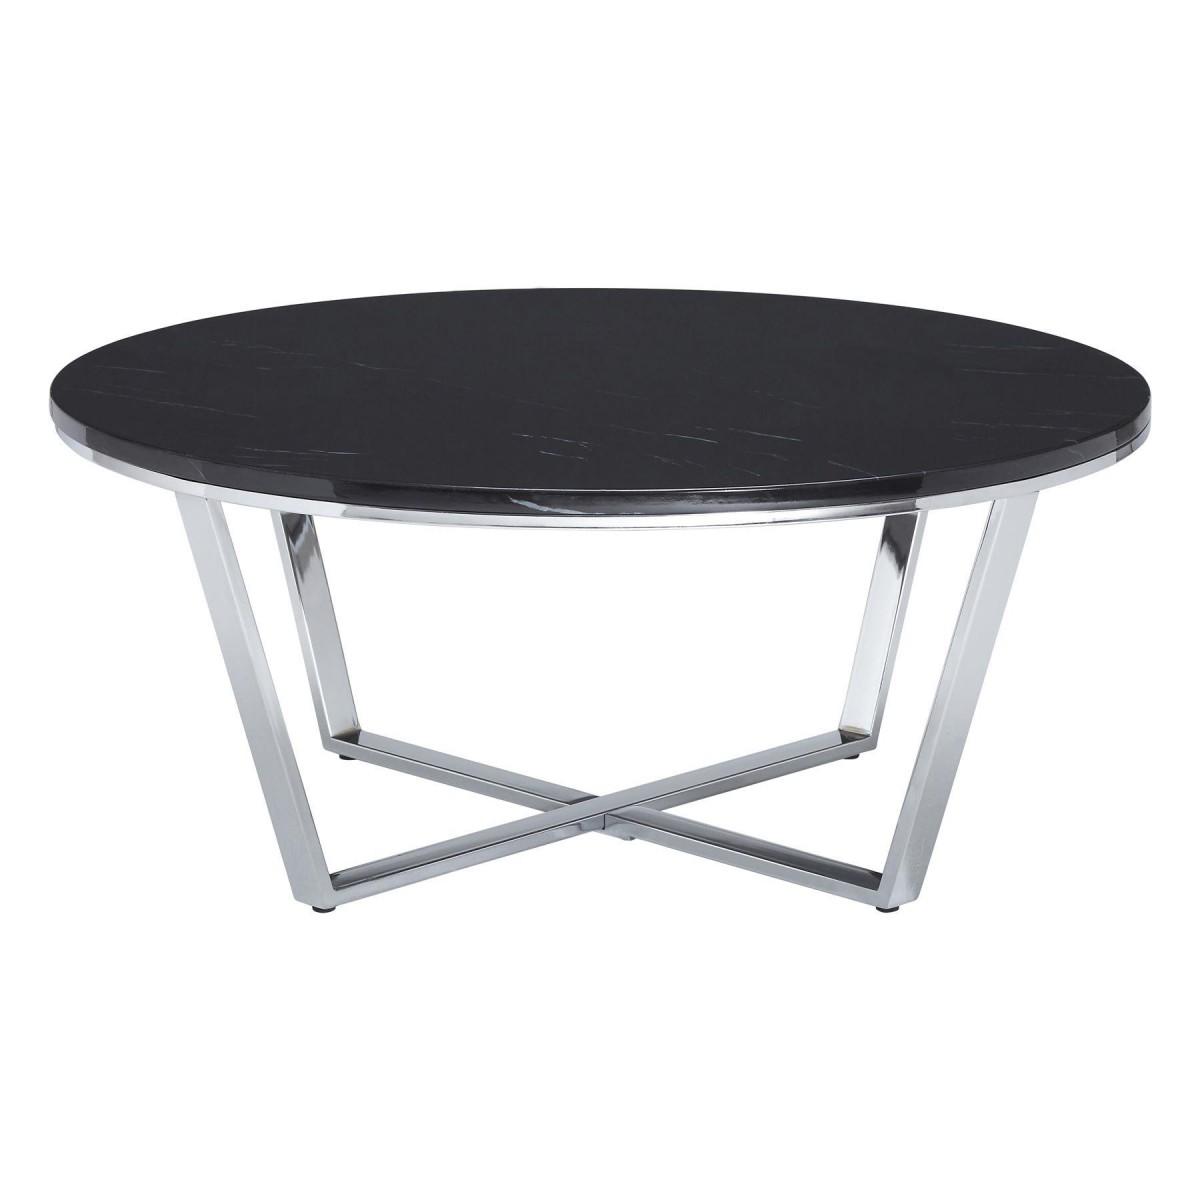 Premium Round Coffee Table Black Faux Marble Chrome